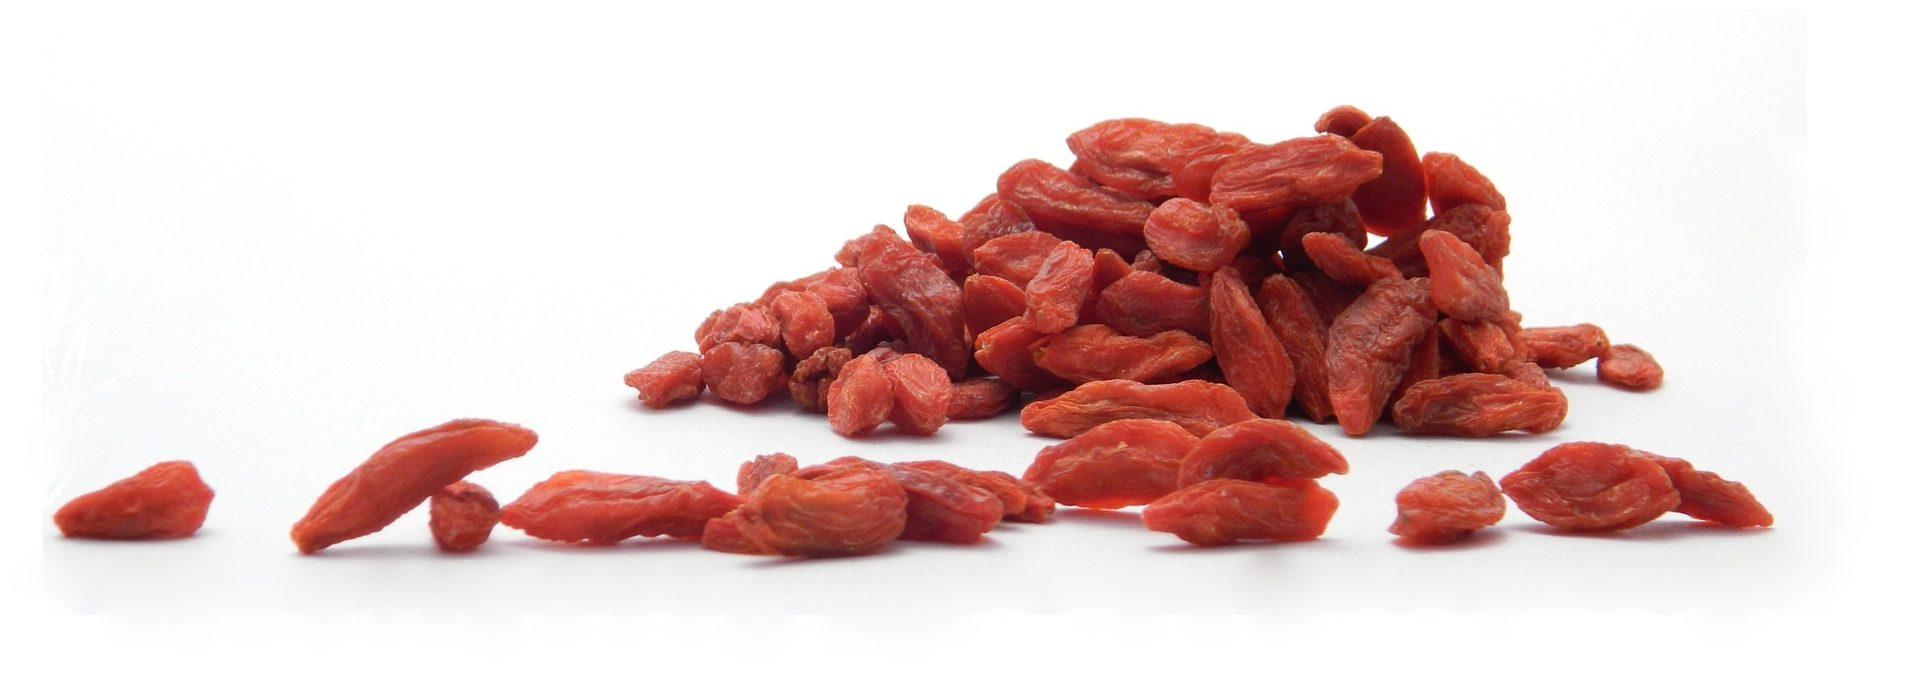 Top Antioxidant Containing Foods - goji berries